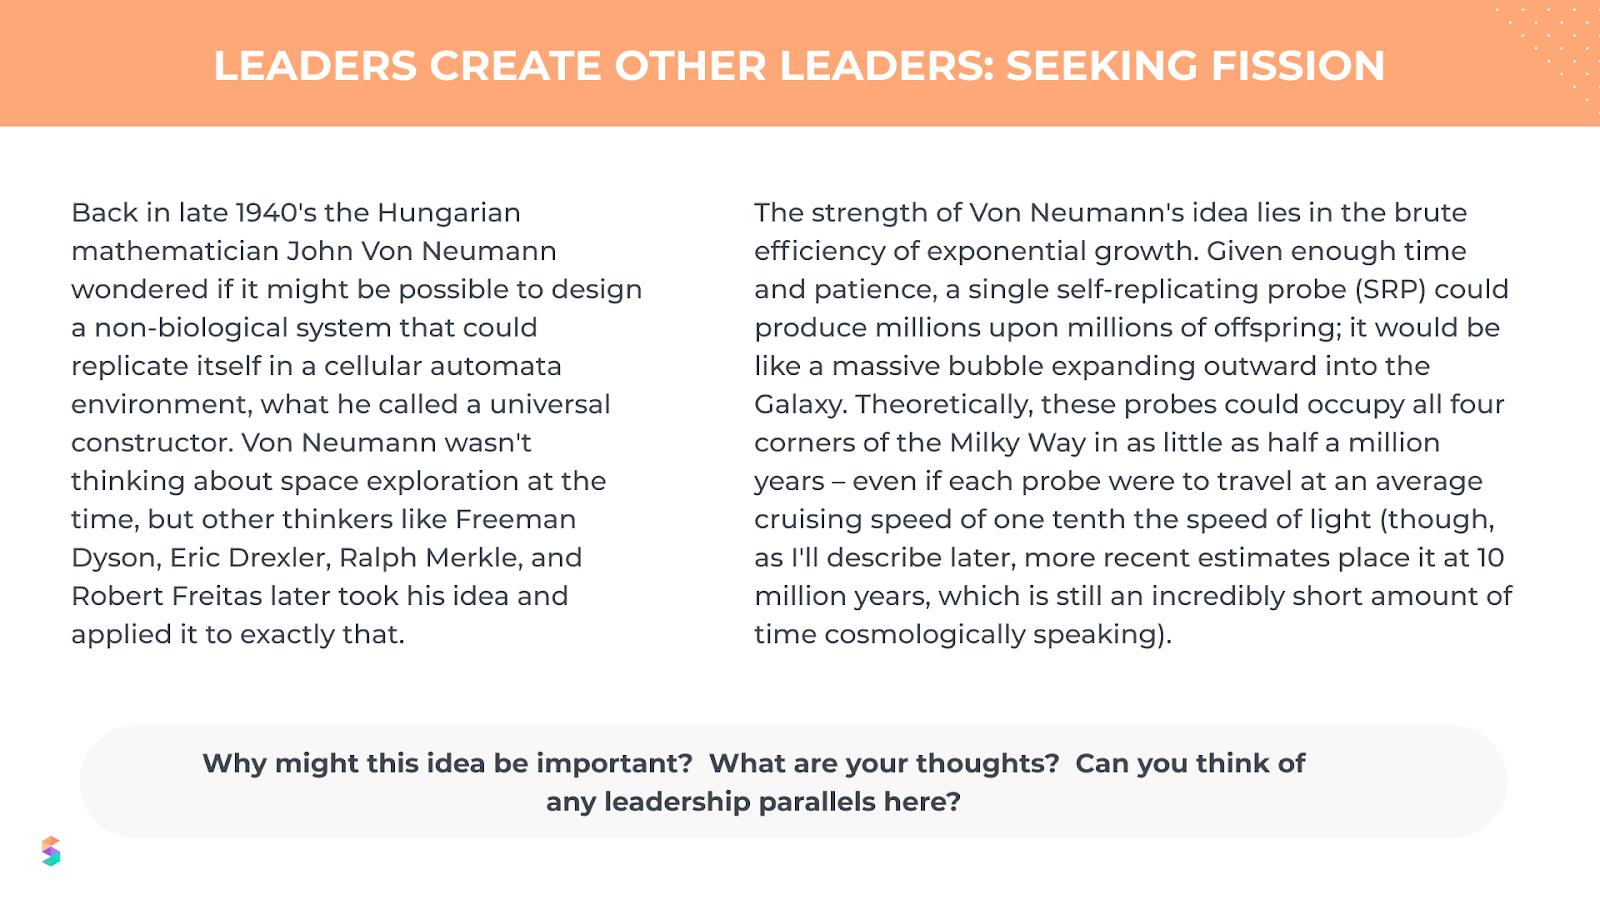 leaders create other leaders